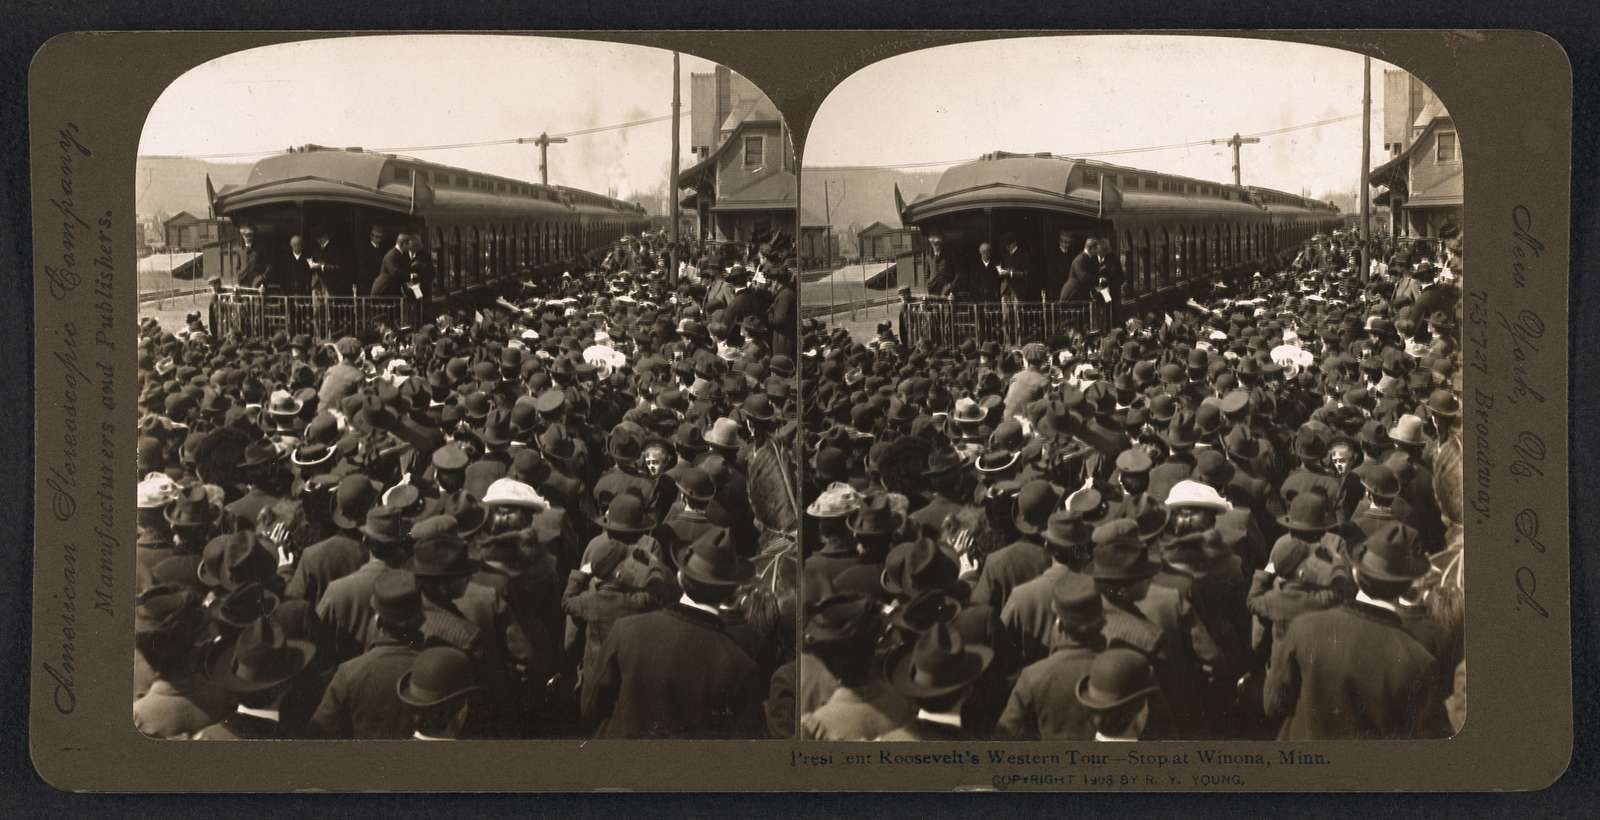 President Roosevelt's western tour - stop at Winona, Minn.